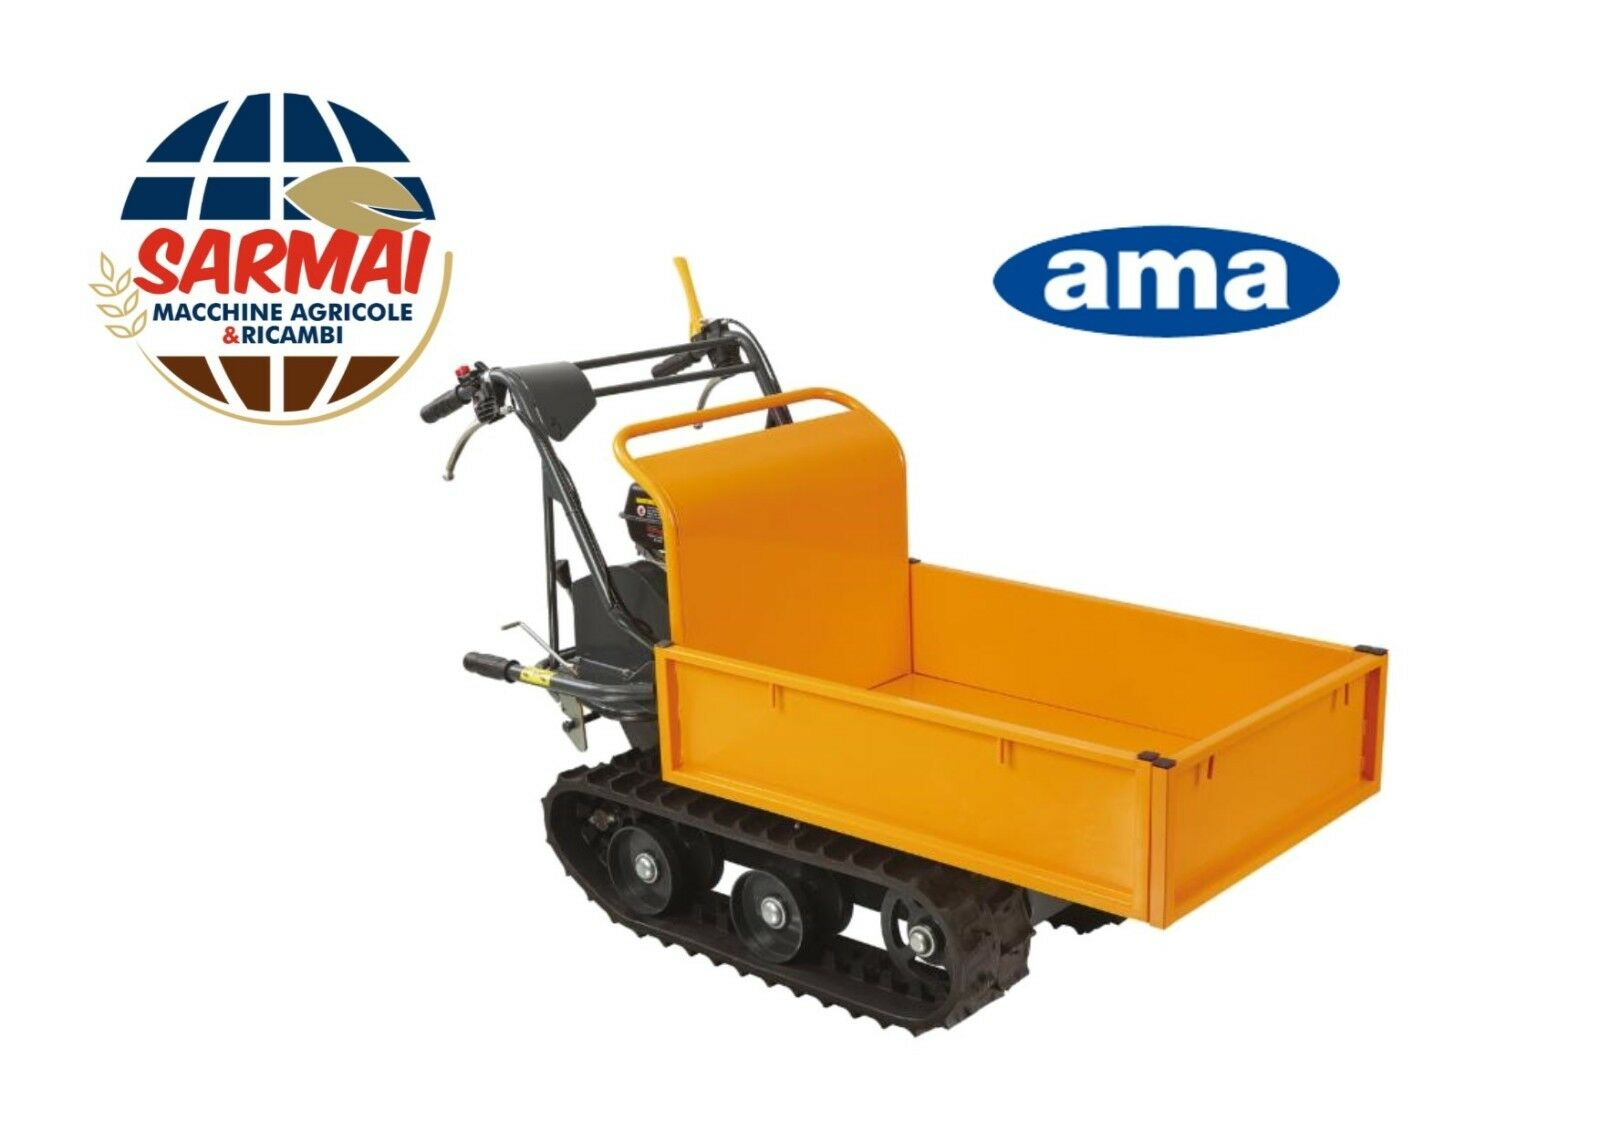 Motocarriola cingolata AMA portata 300kg cassone estendibile estendibile estendibile carriola 28d158